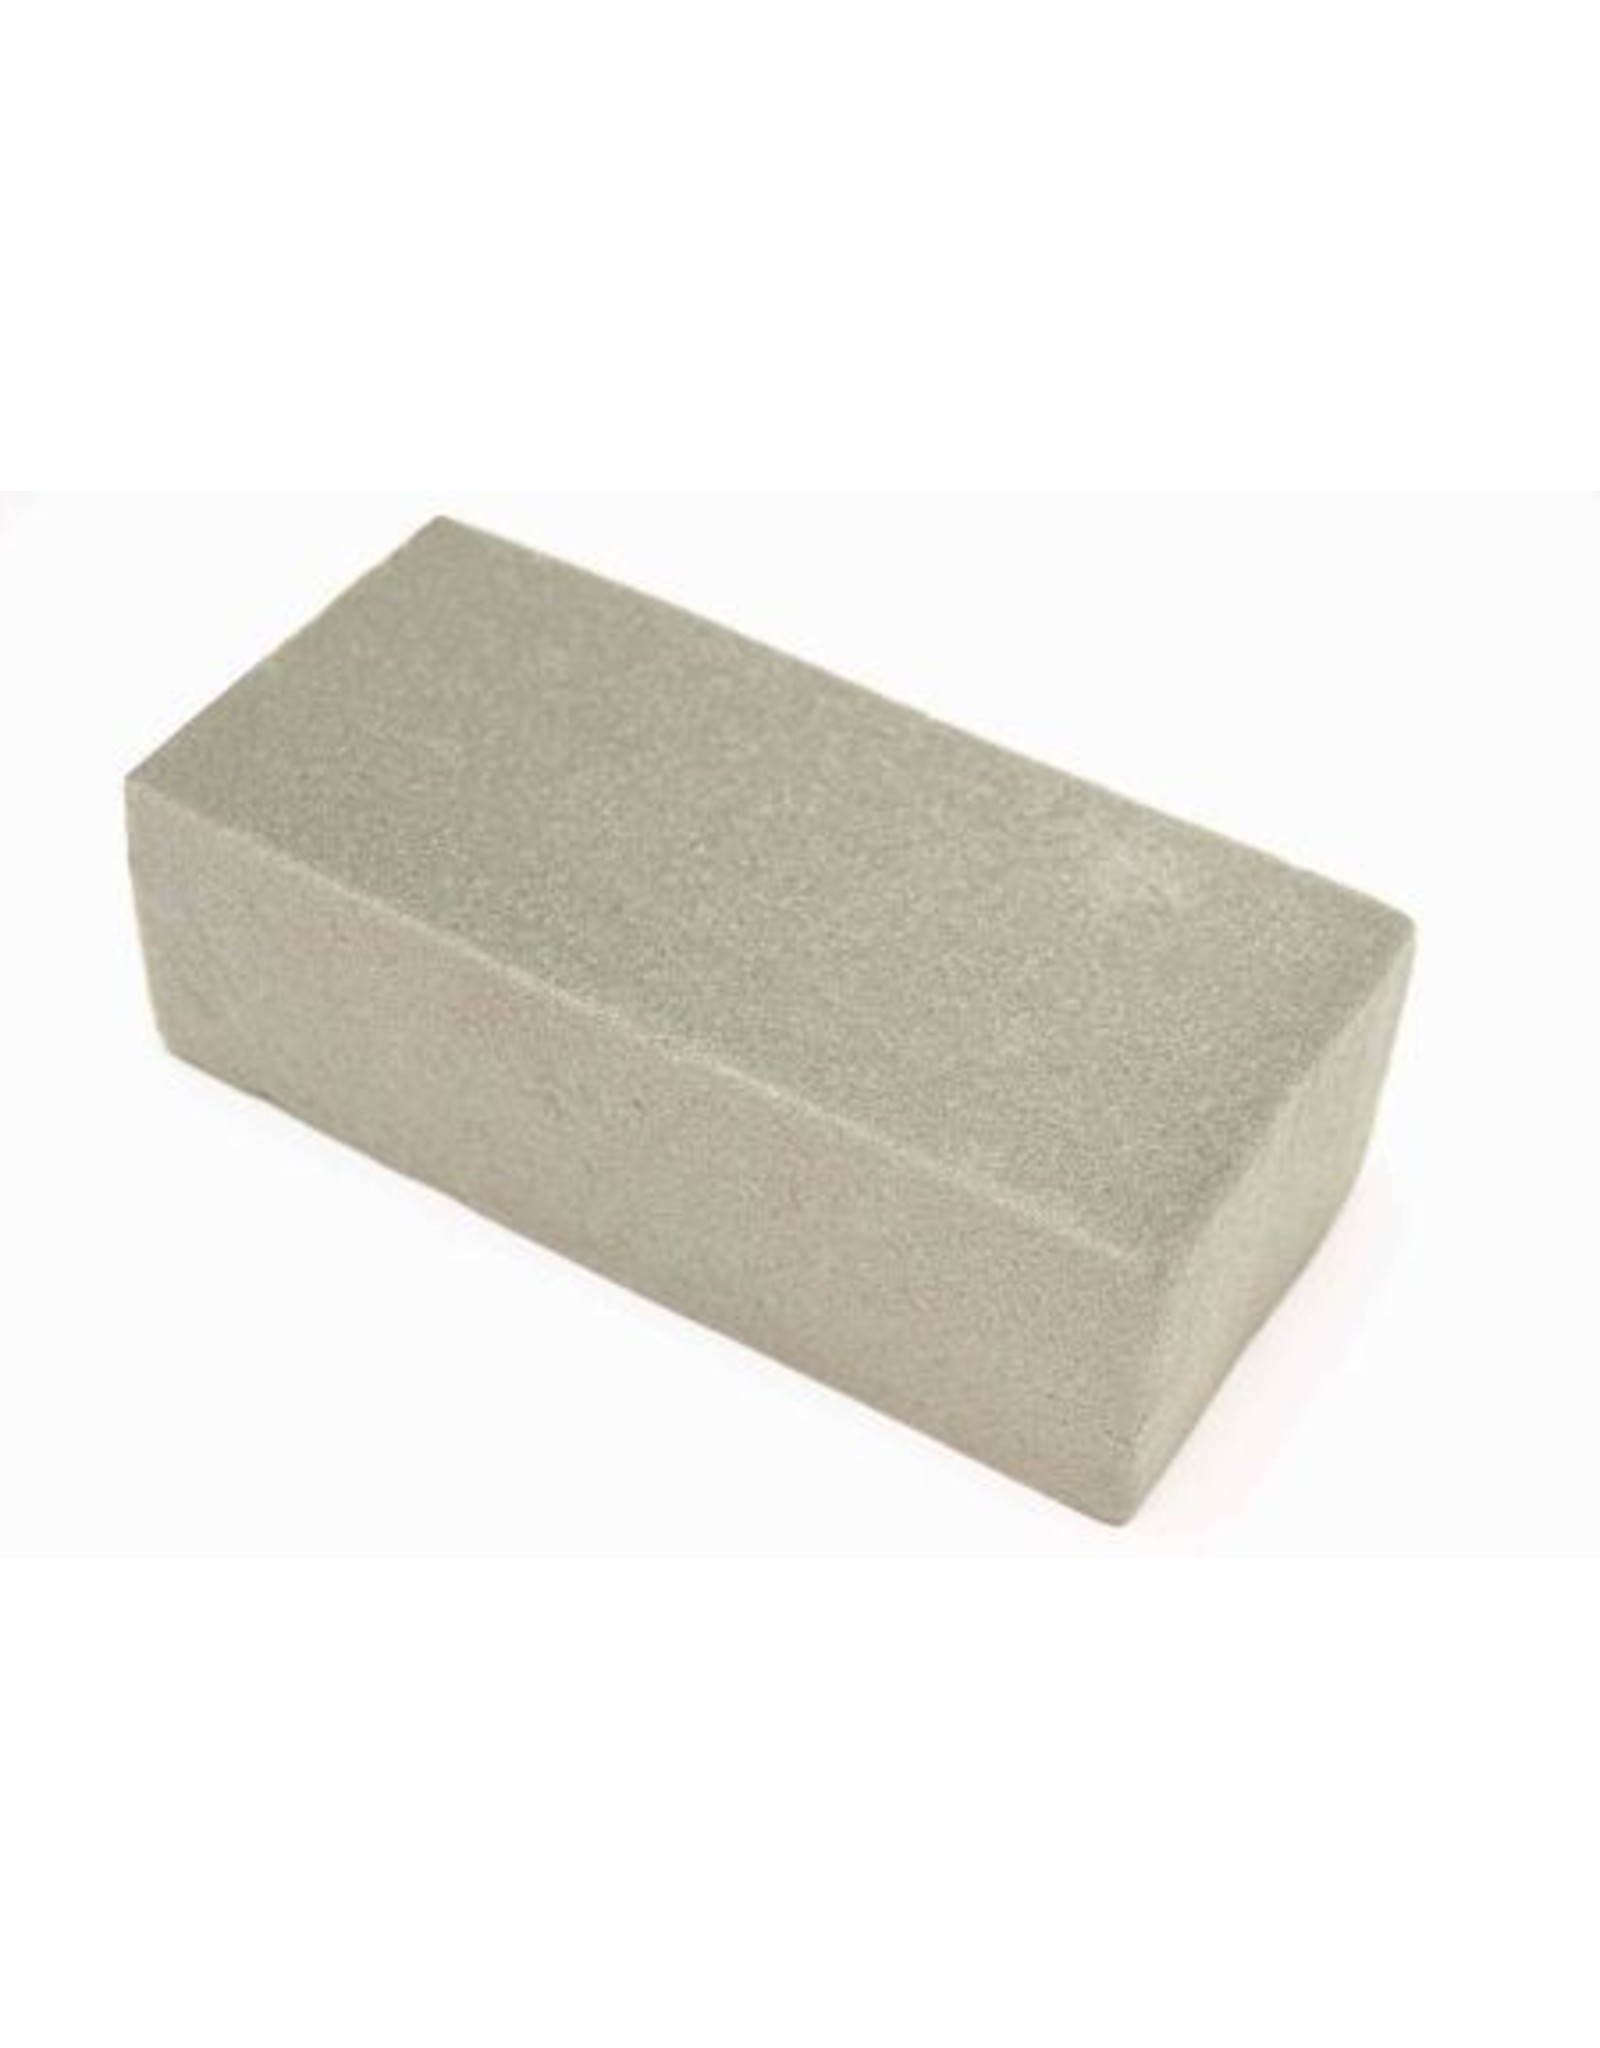 HD Basic Brick Dry Foam ↑20.0 Ø10.0 ↑7.5 (x 20)